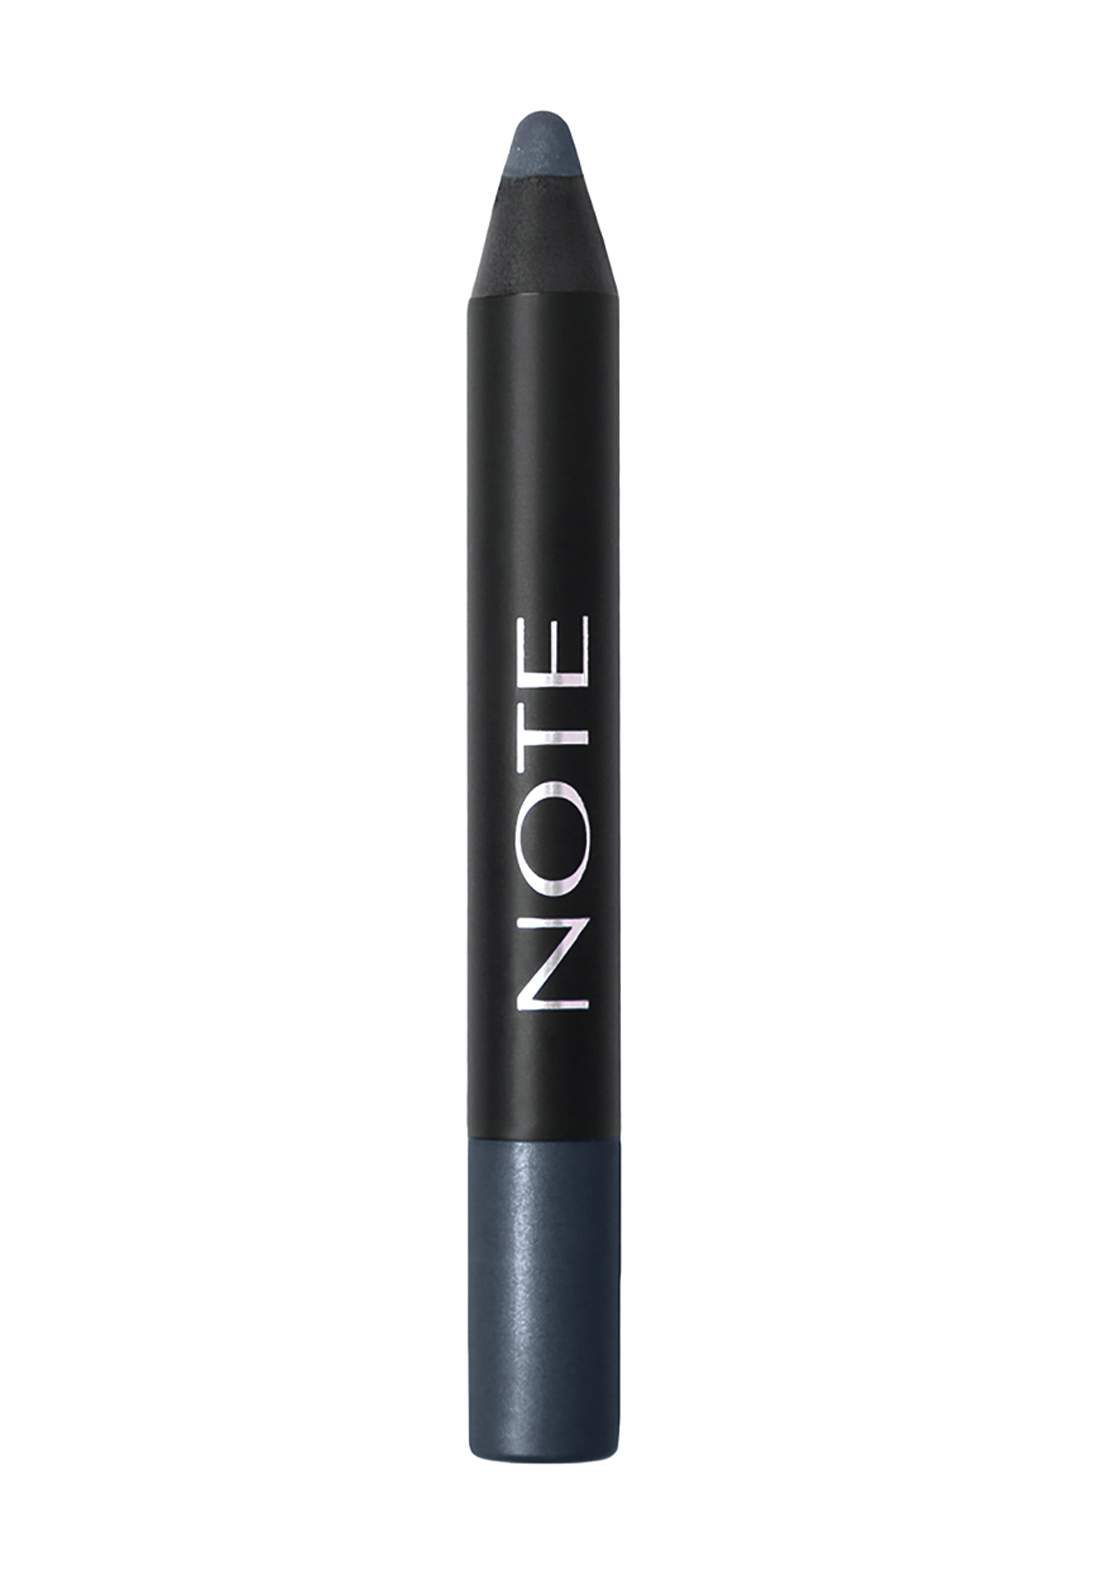 Note Cosmetics Jumbo Pencil Headlight Anthracite Blue No.06 قلم ظلال العيون